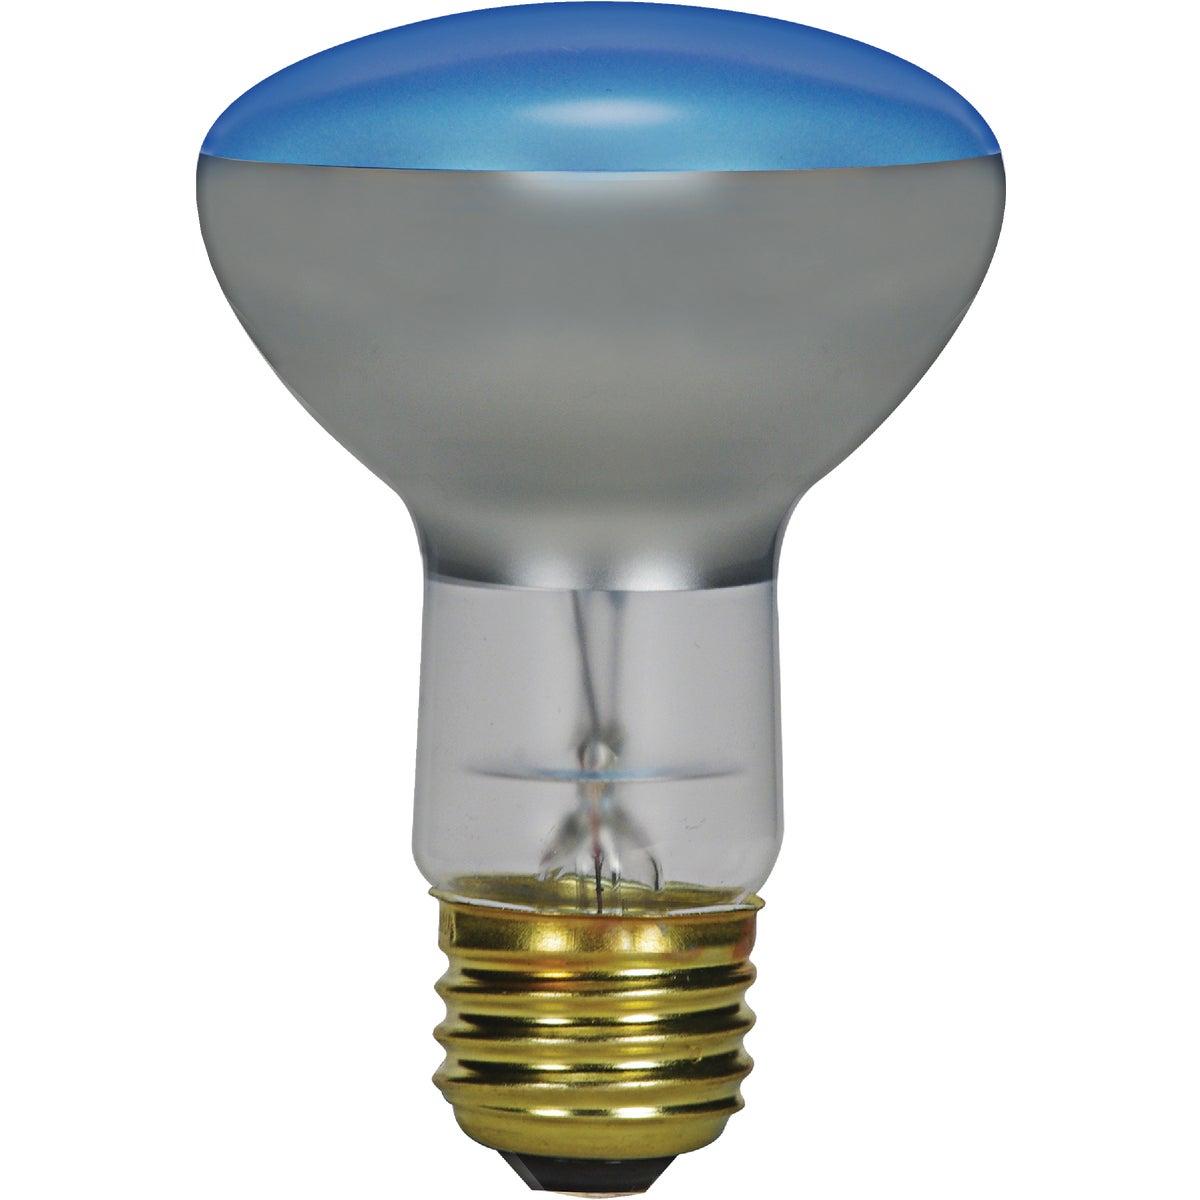 50W PLANT LIGHT BULB - 14888 by G E Lighting